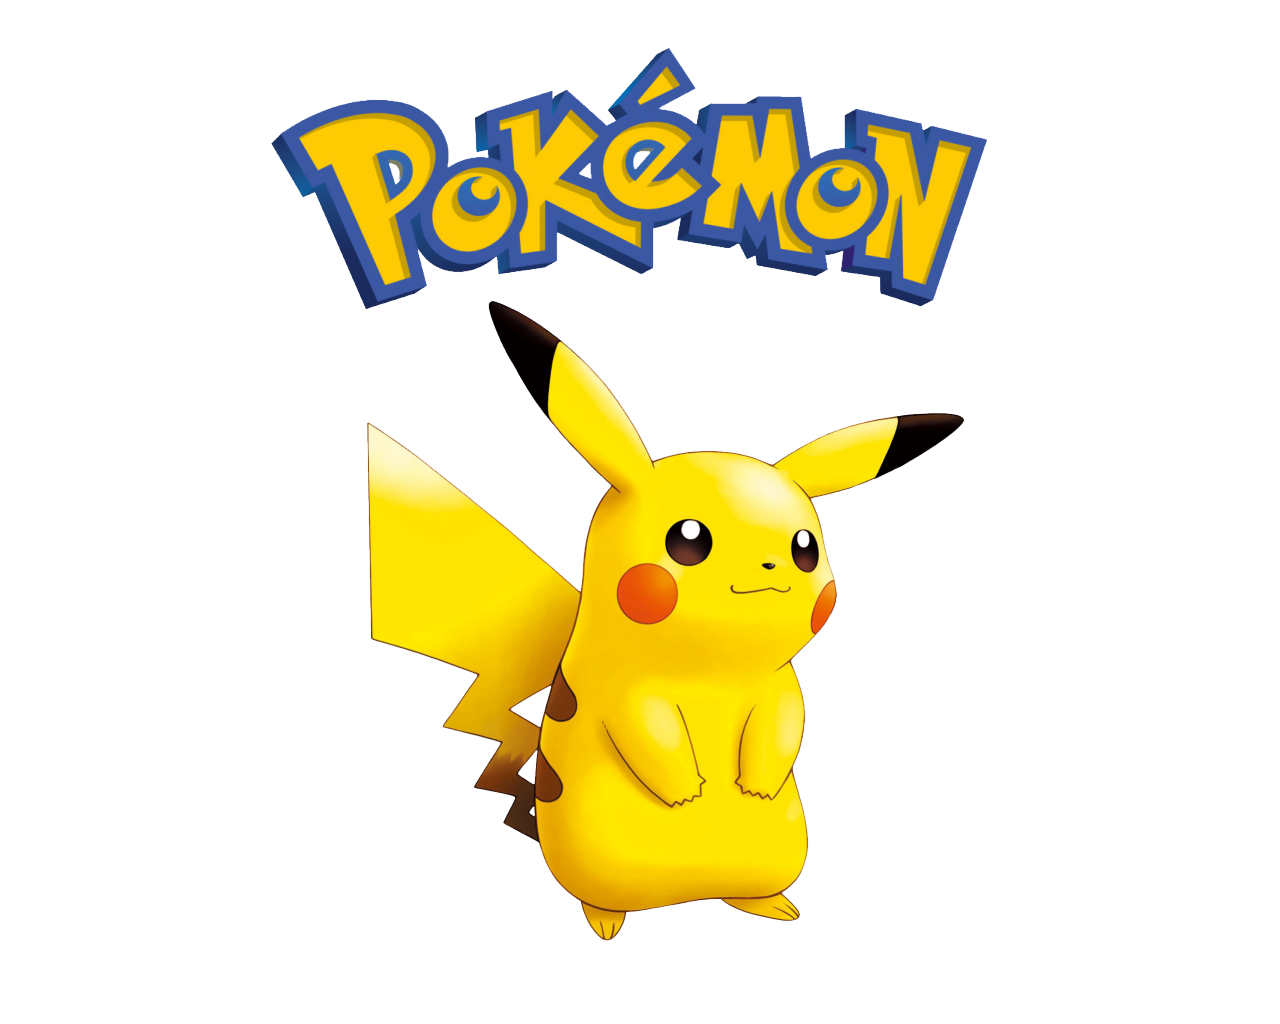 Pokemon Pikachu Wallpaper Wallpapersafari